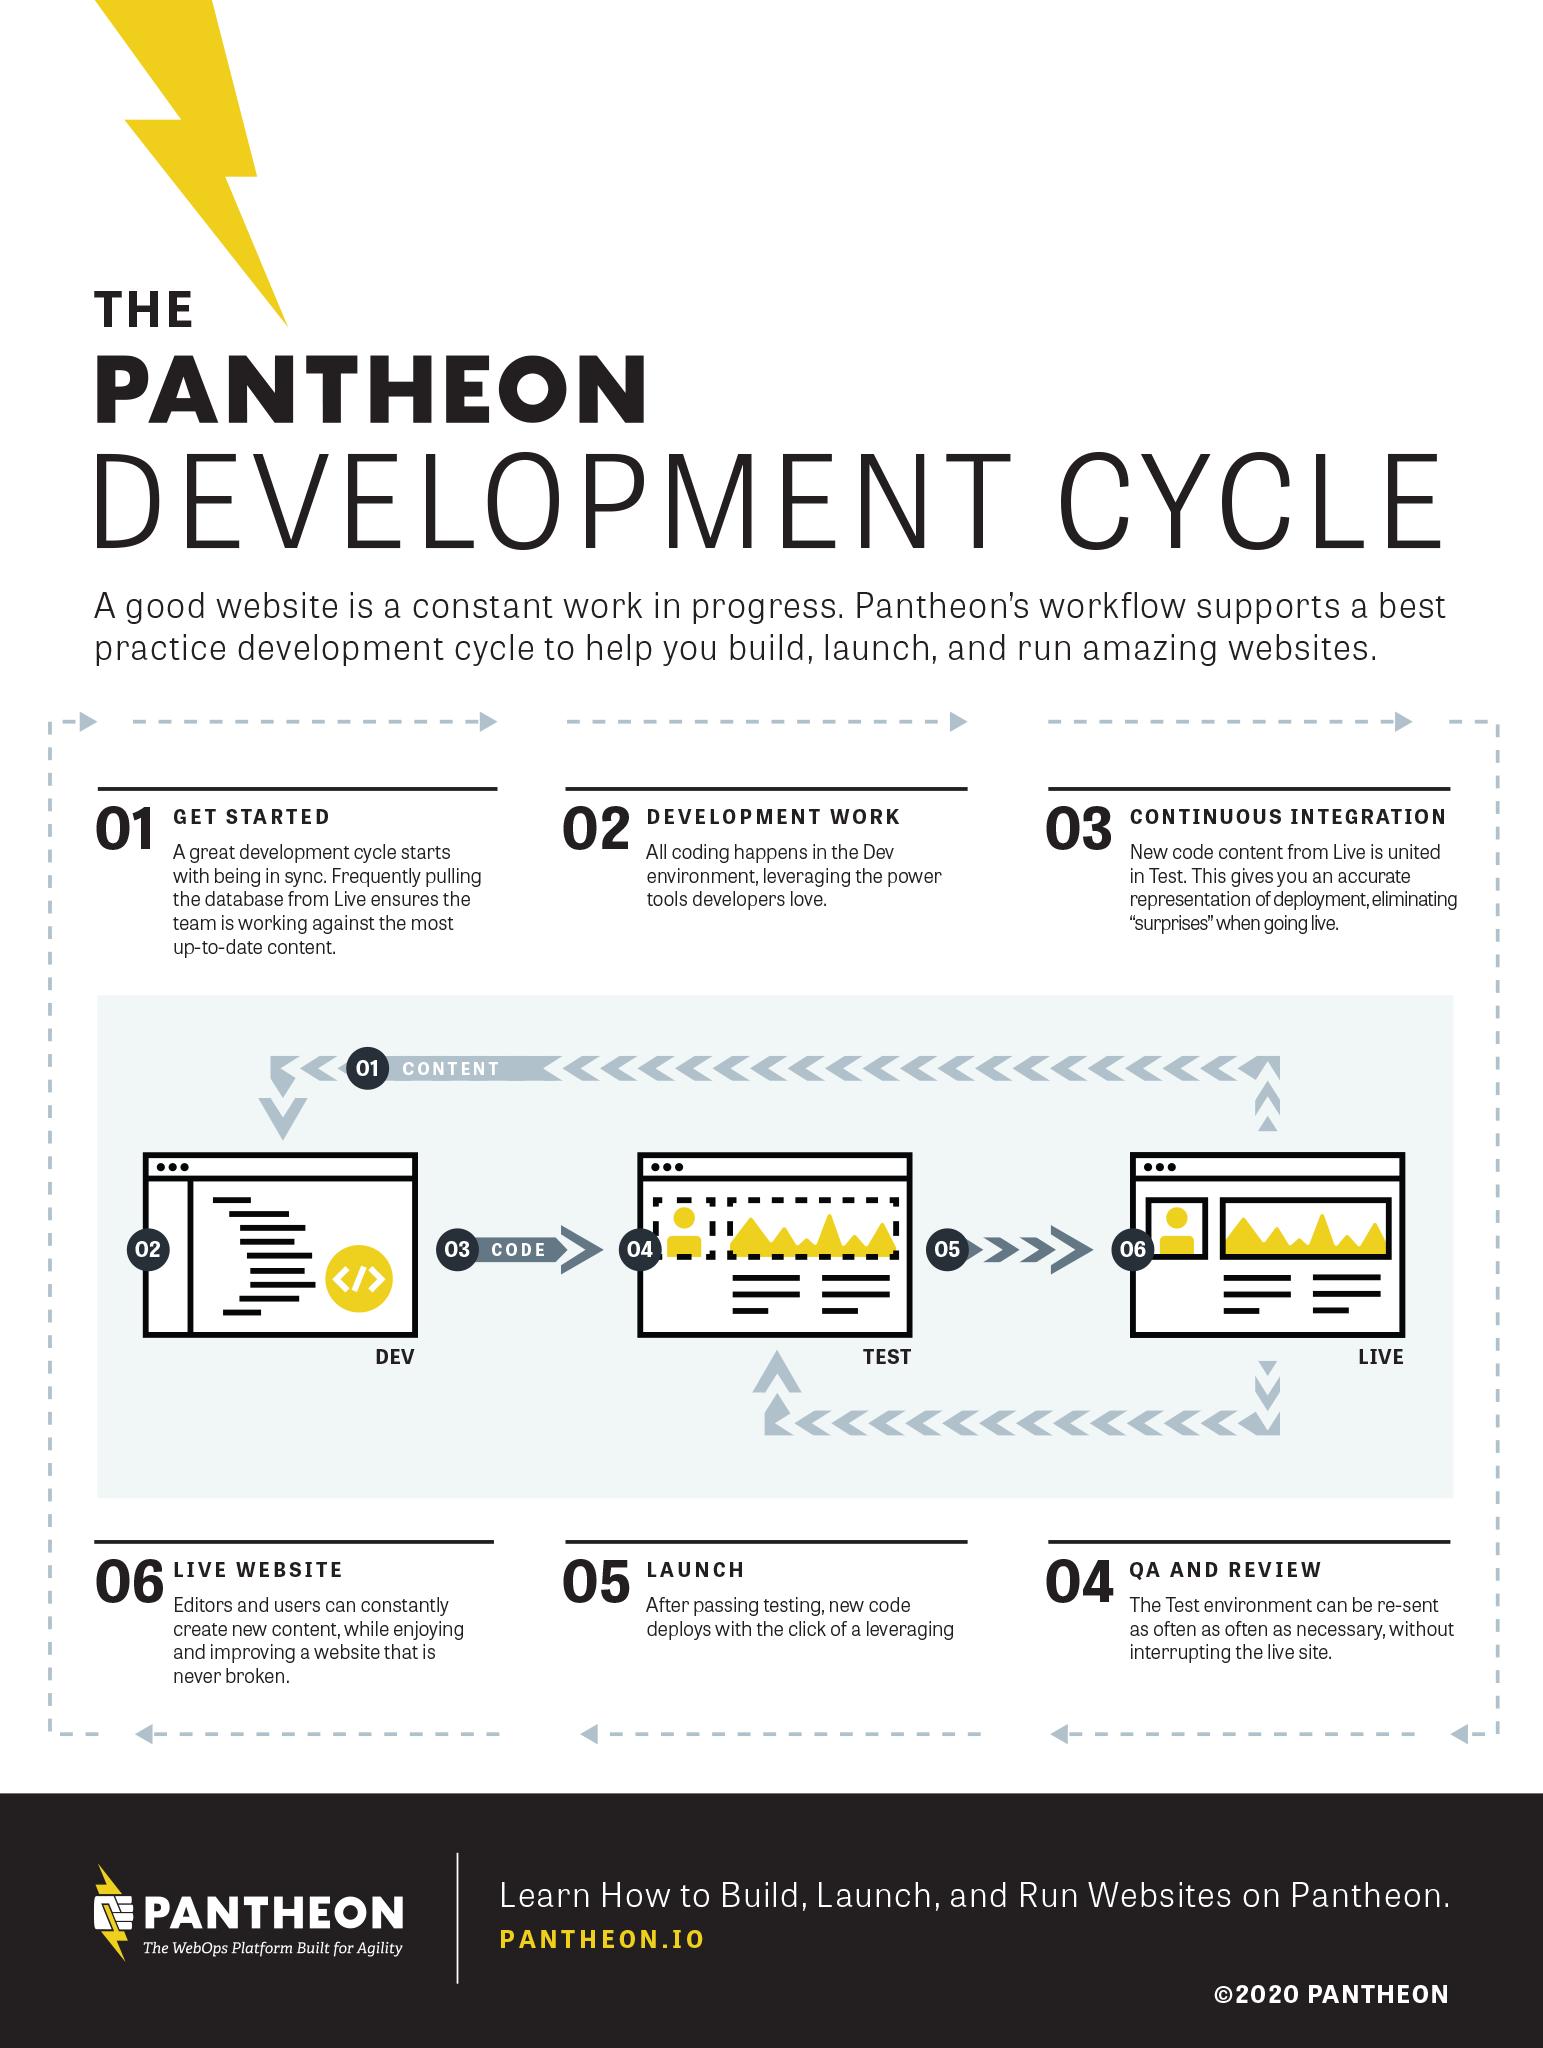 Forrester TEI Infographic of Pantheon Website Portfolio Management